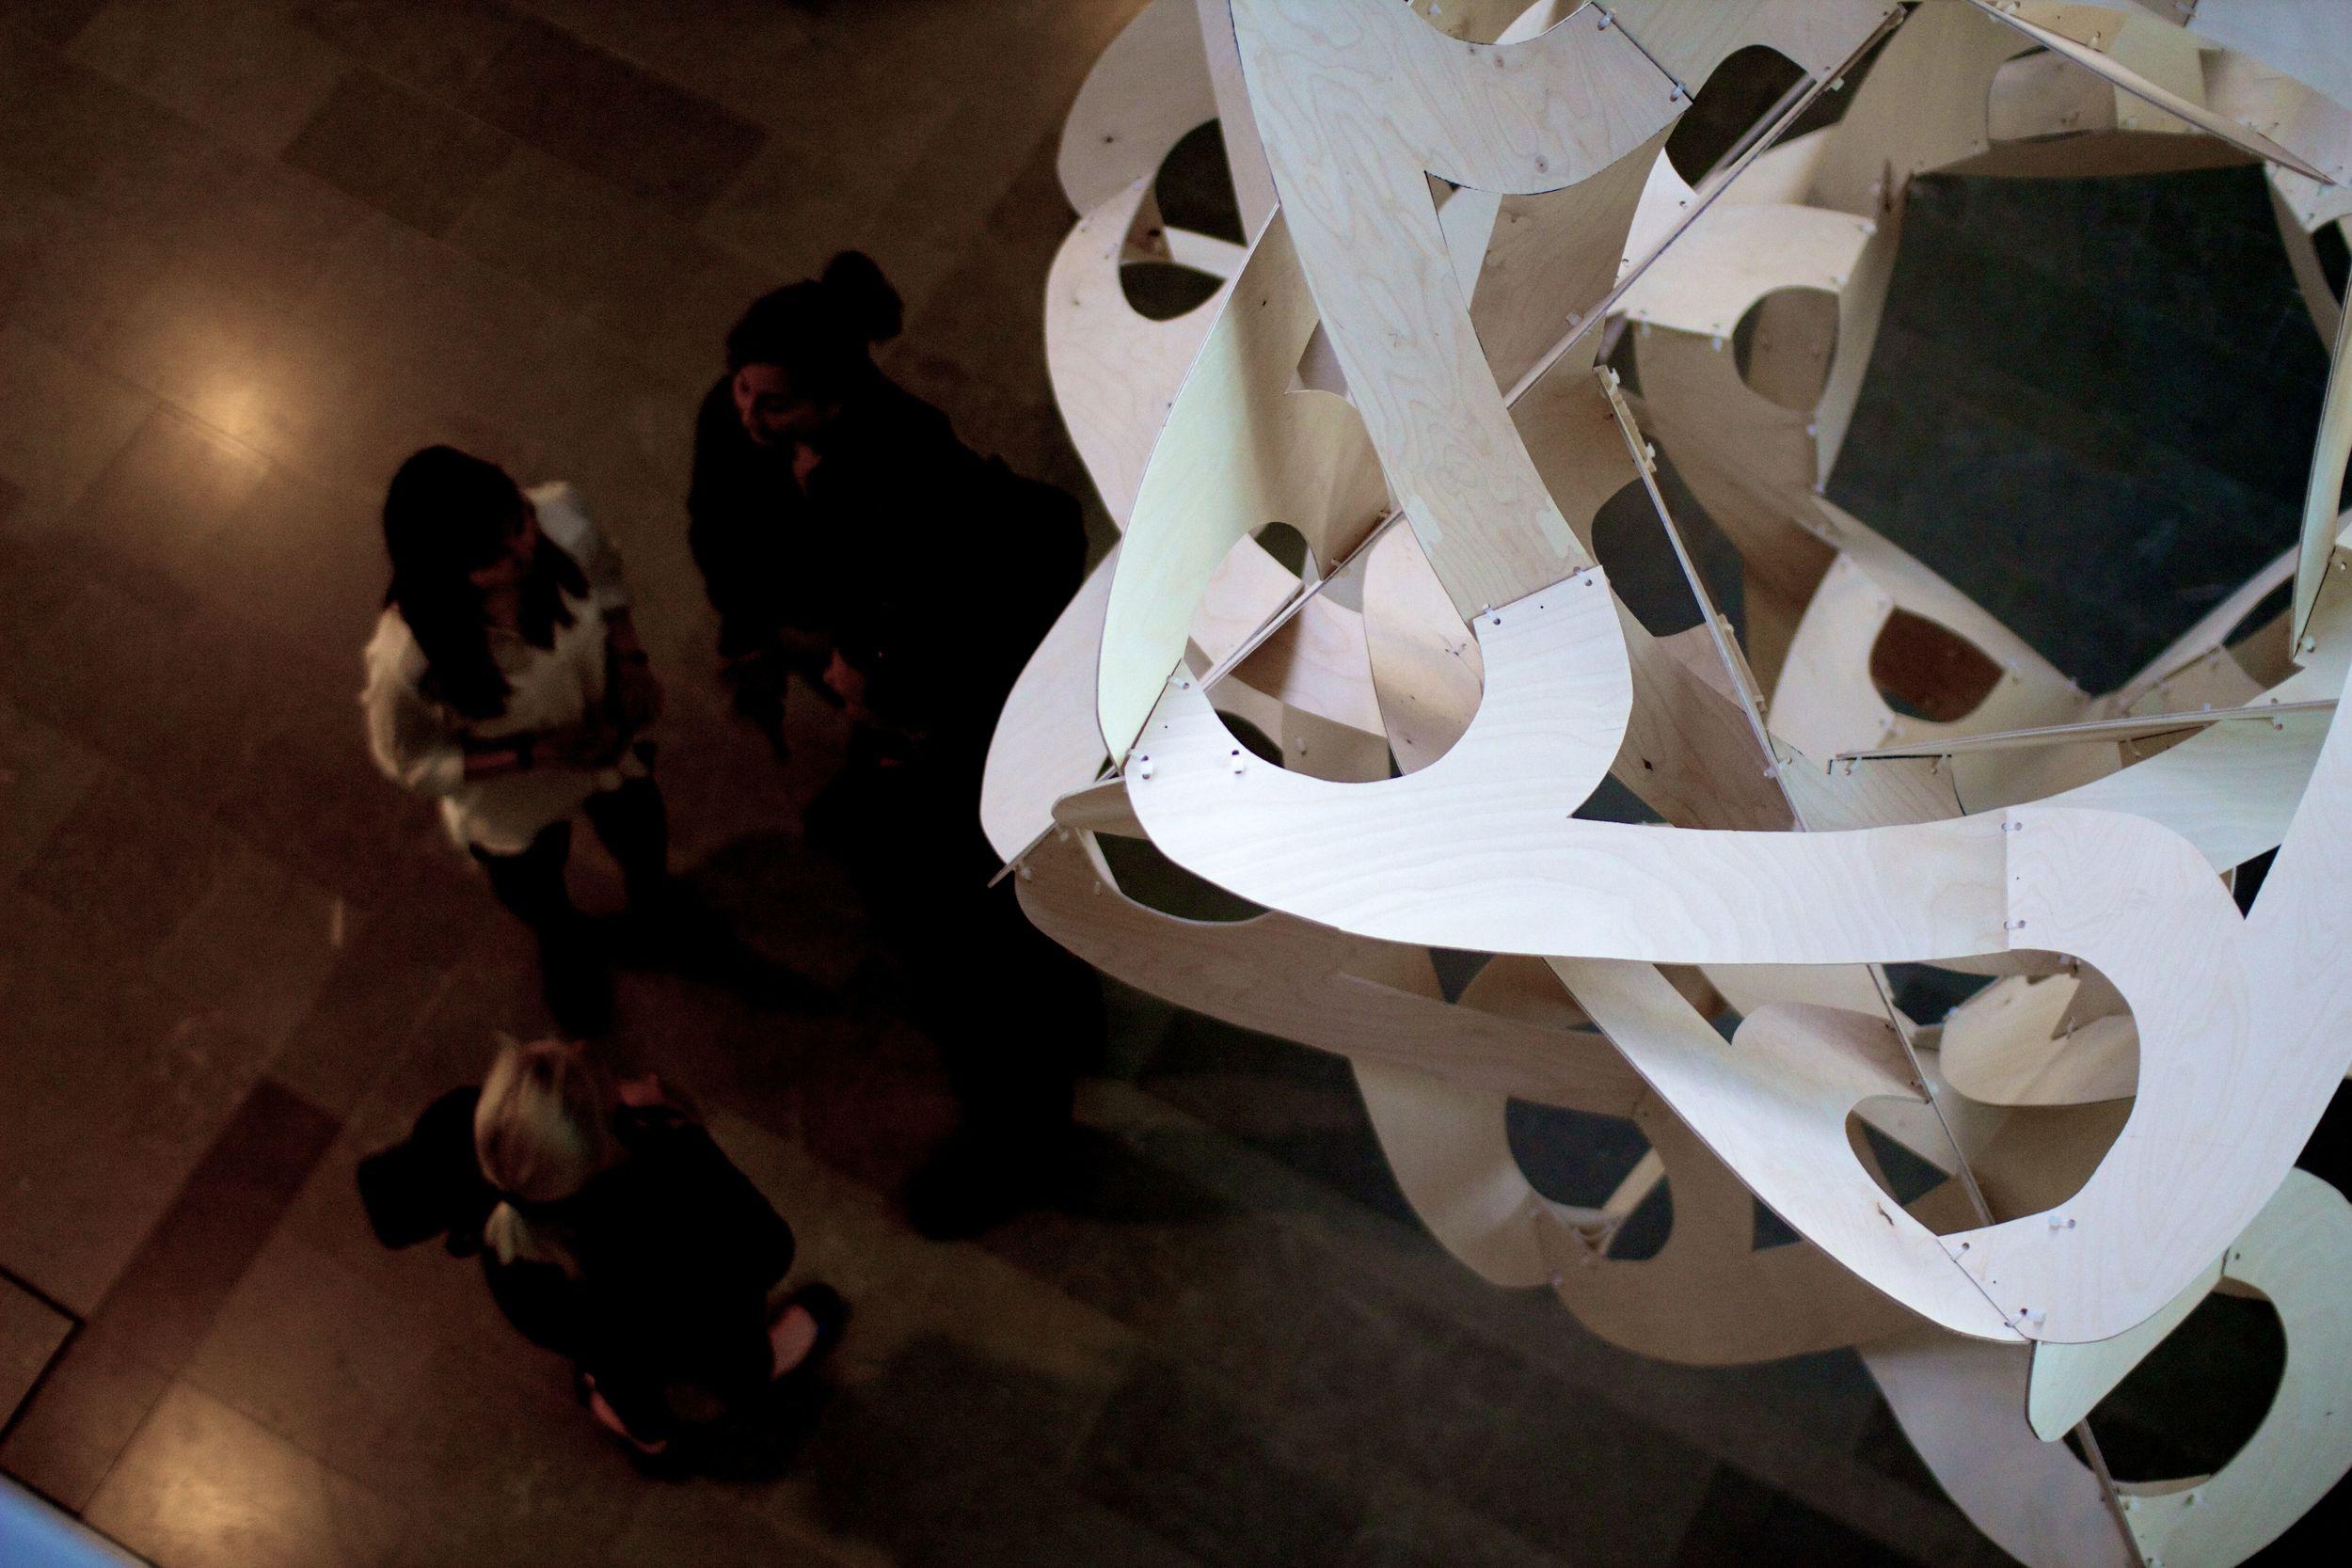 Aalto_Sculptures_1_Eero_Kaarlehto.jpg